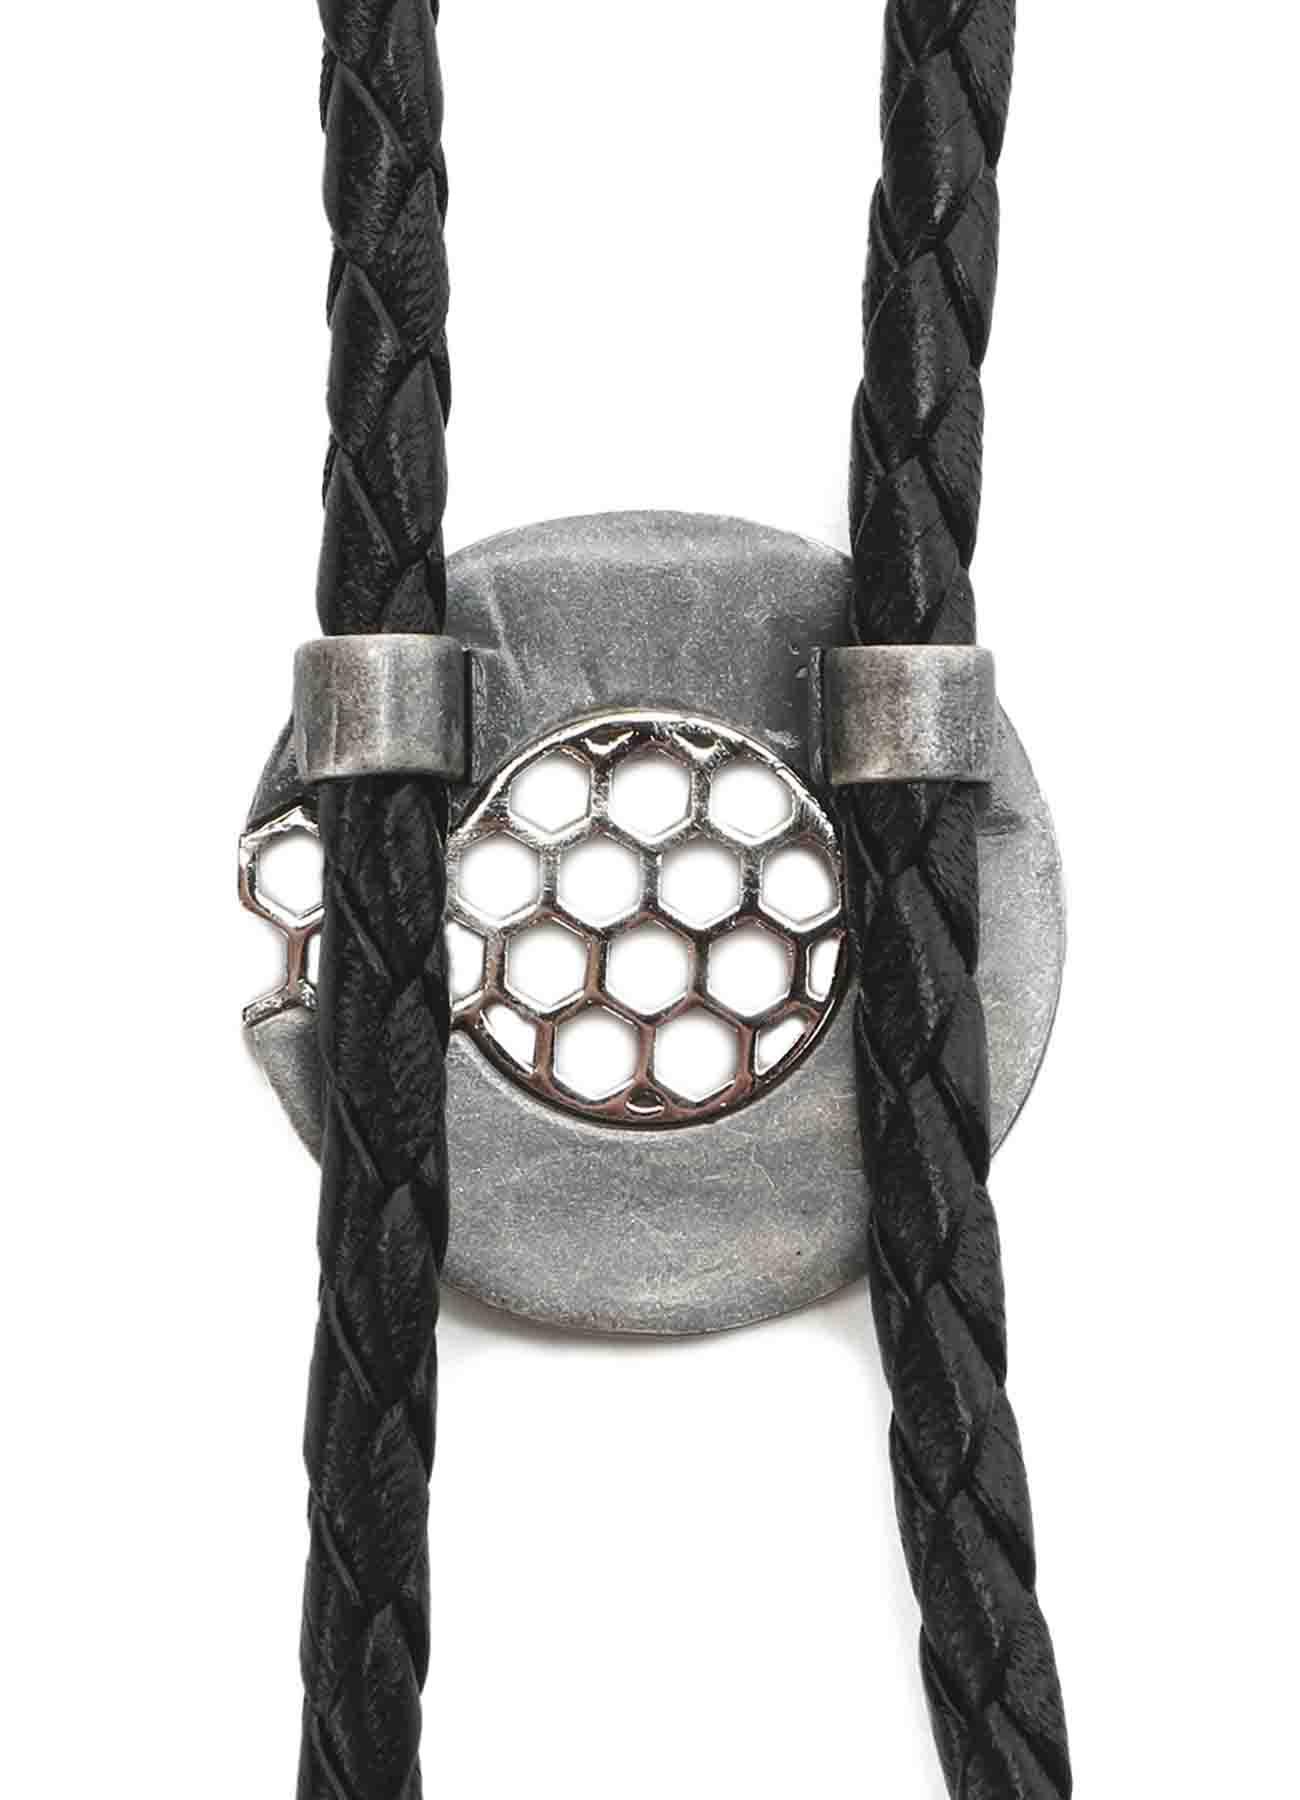 Brass Leather Strap Loop Tie